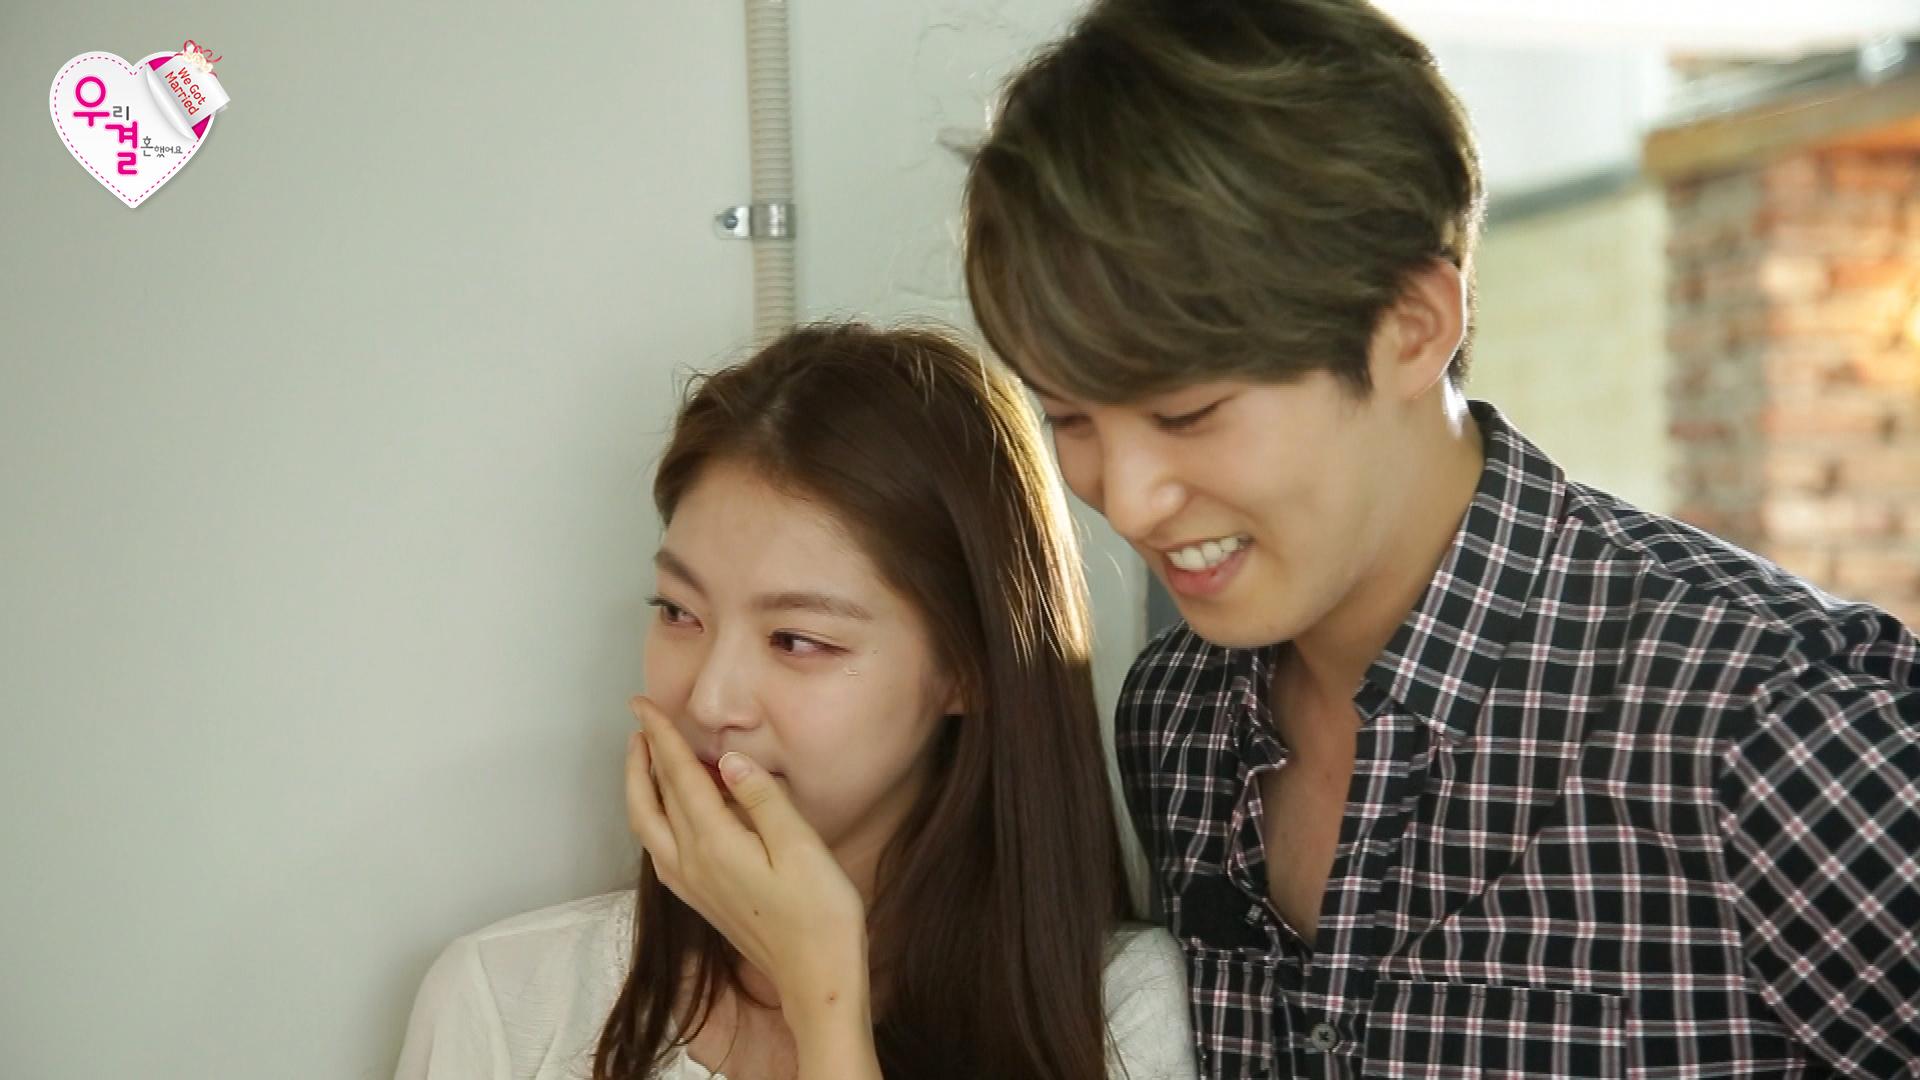 Lee Jonghyun News: Lee Jong Hyun And Gong Seung Yeon Reach A Beautiful End On